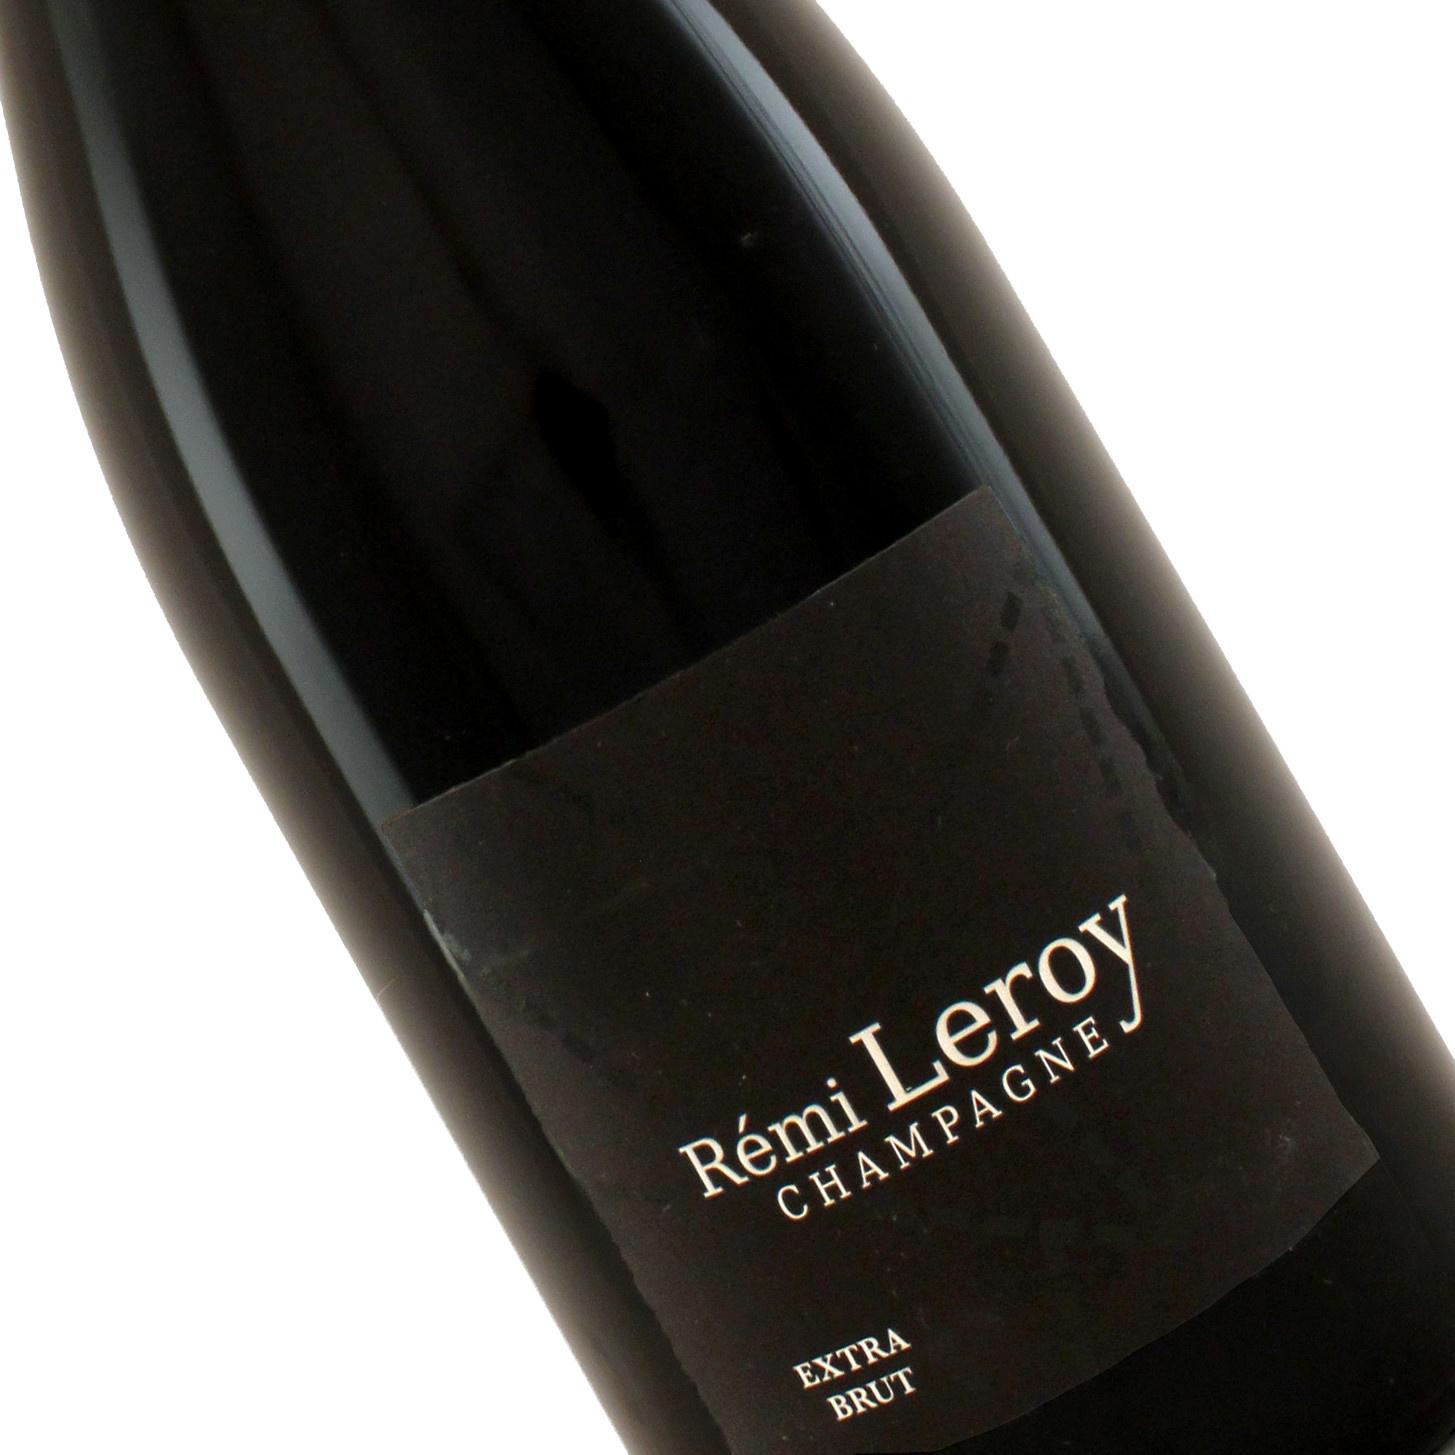 Remi Leroy N.V. Champagne Extra Brut